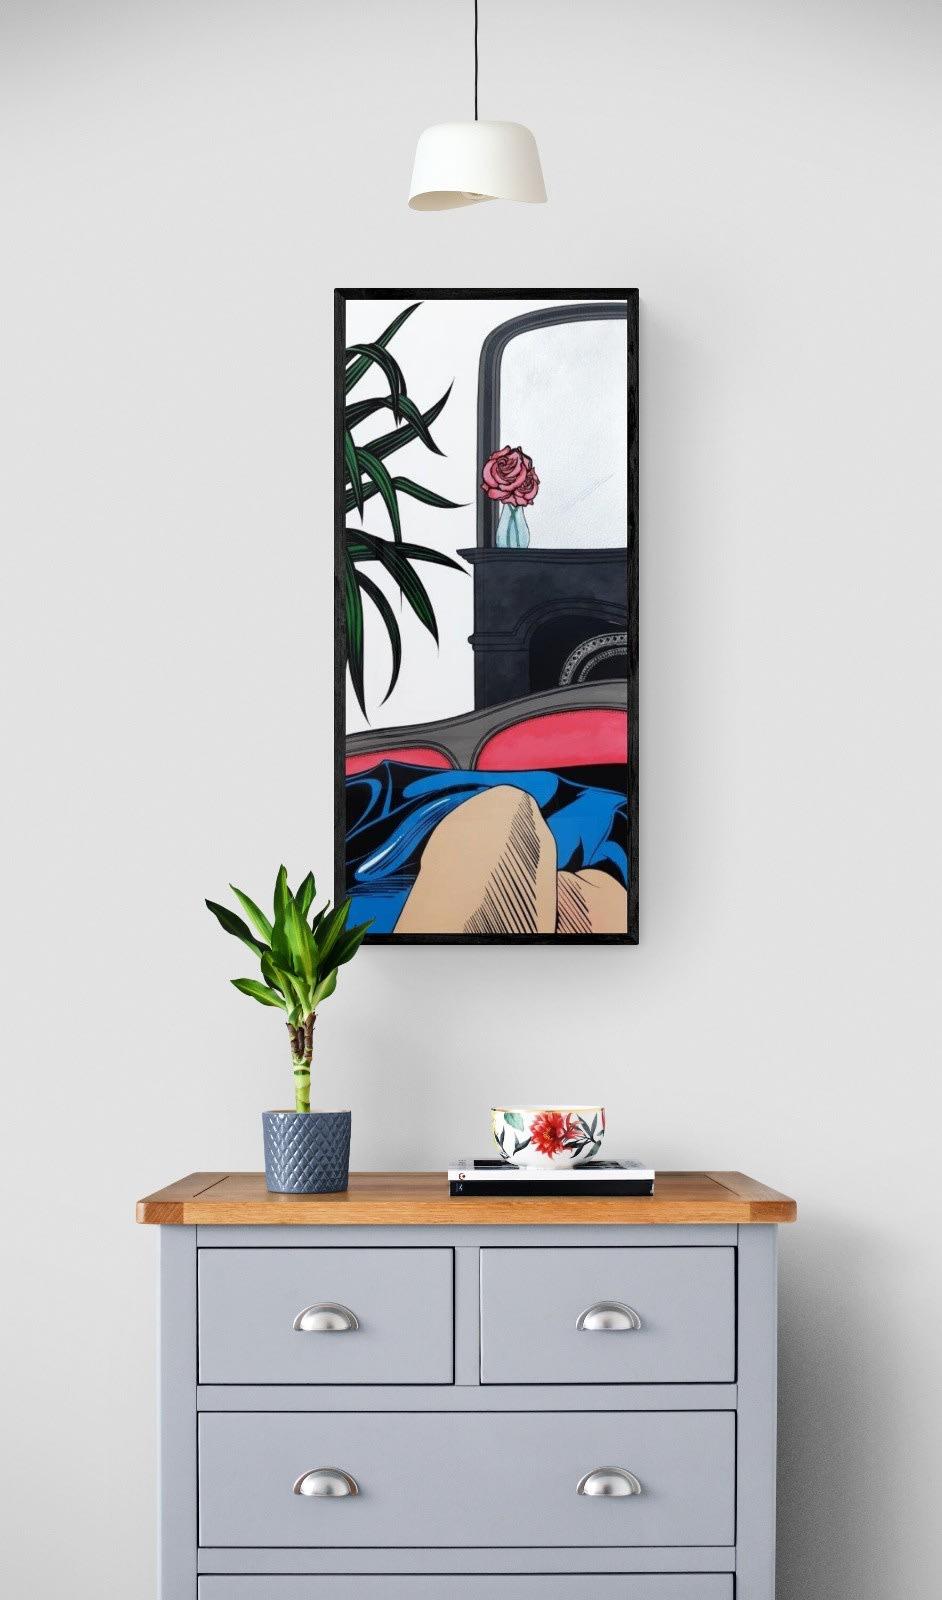 DEBORAH AZZOPARDI Contemplation, 2020 Acrylic on 640g Paper 108 x 48.3 cm 42 1/2 x 19 in. (DA157)